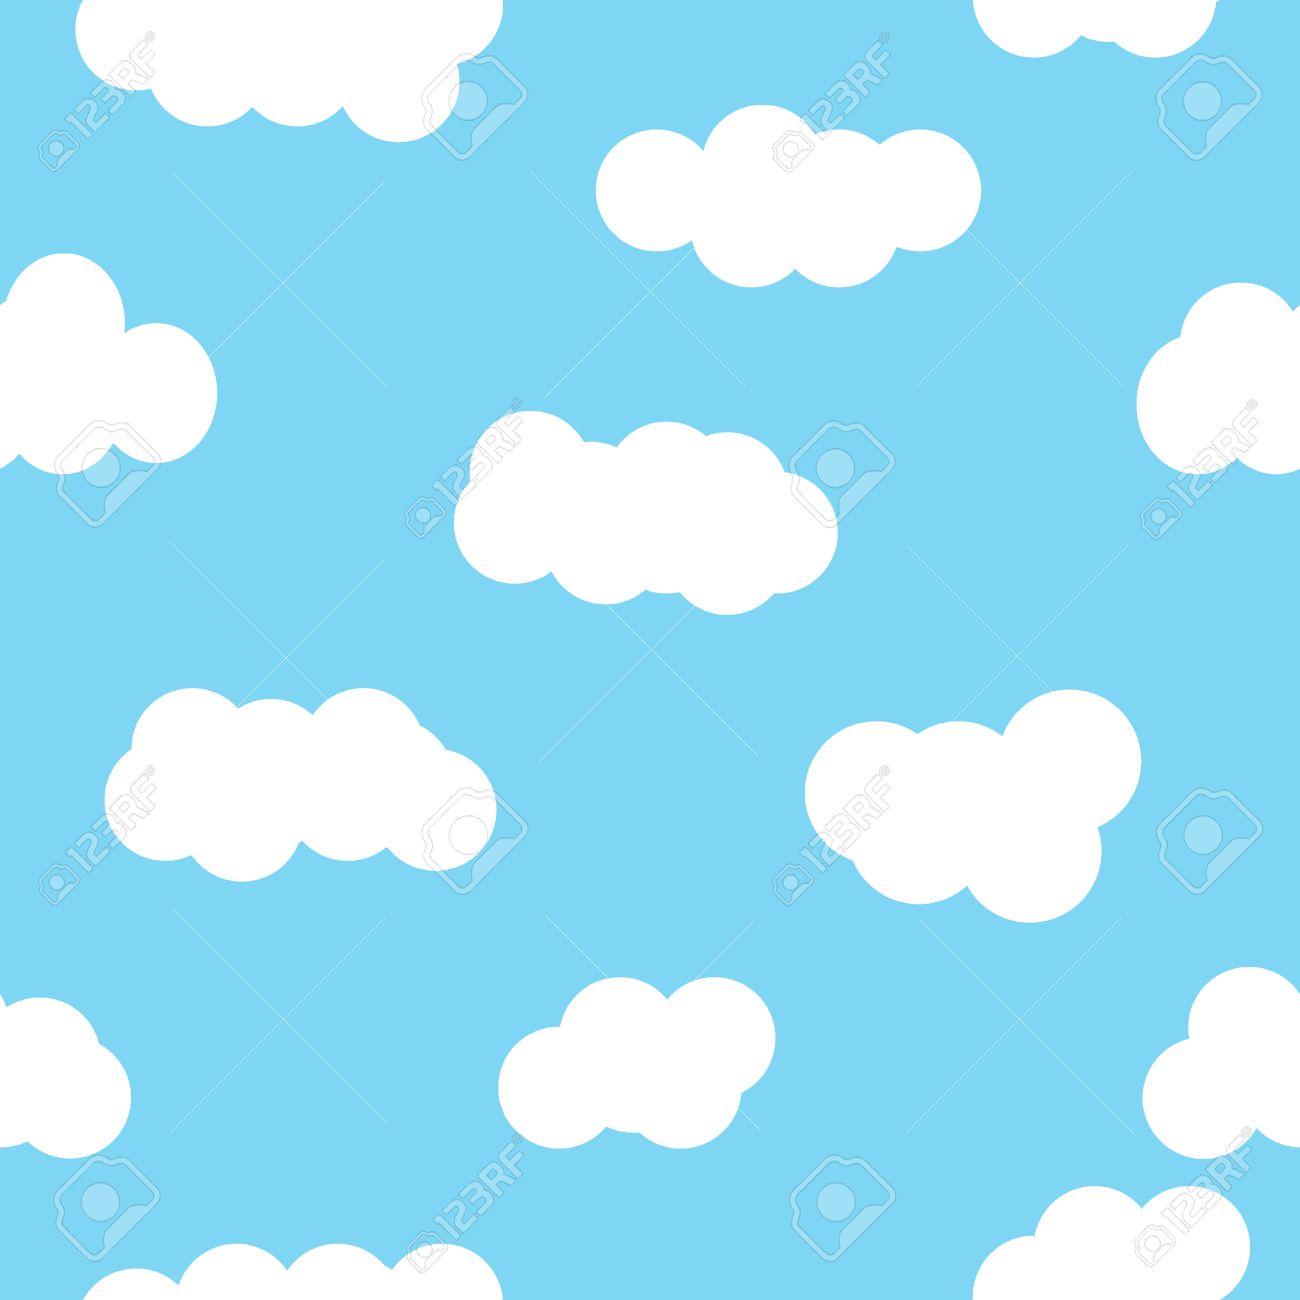 Cloud pattern blue wallpaper design  Seamless cloud pattern